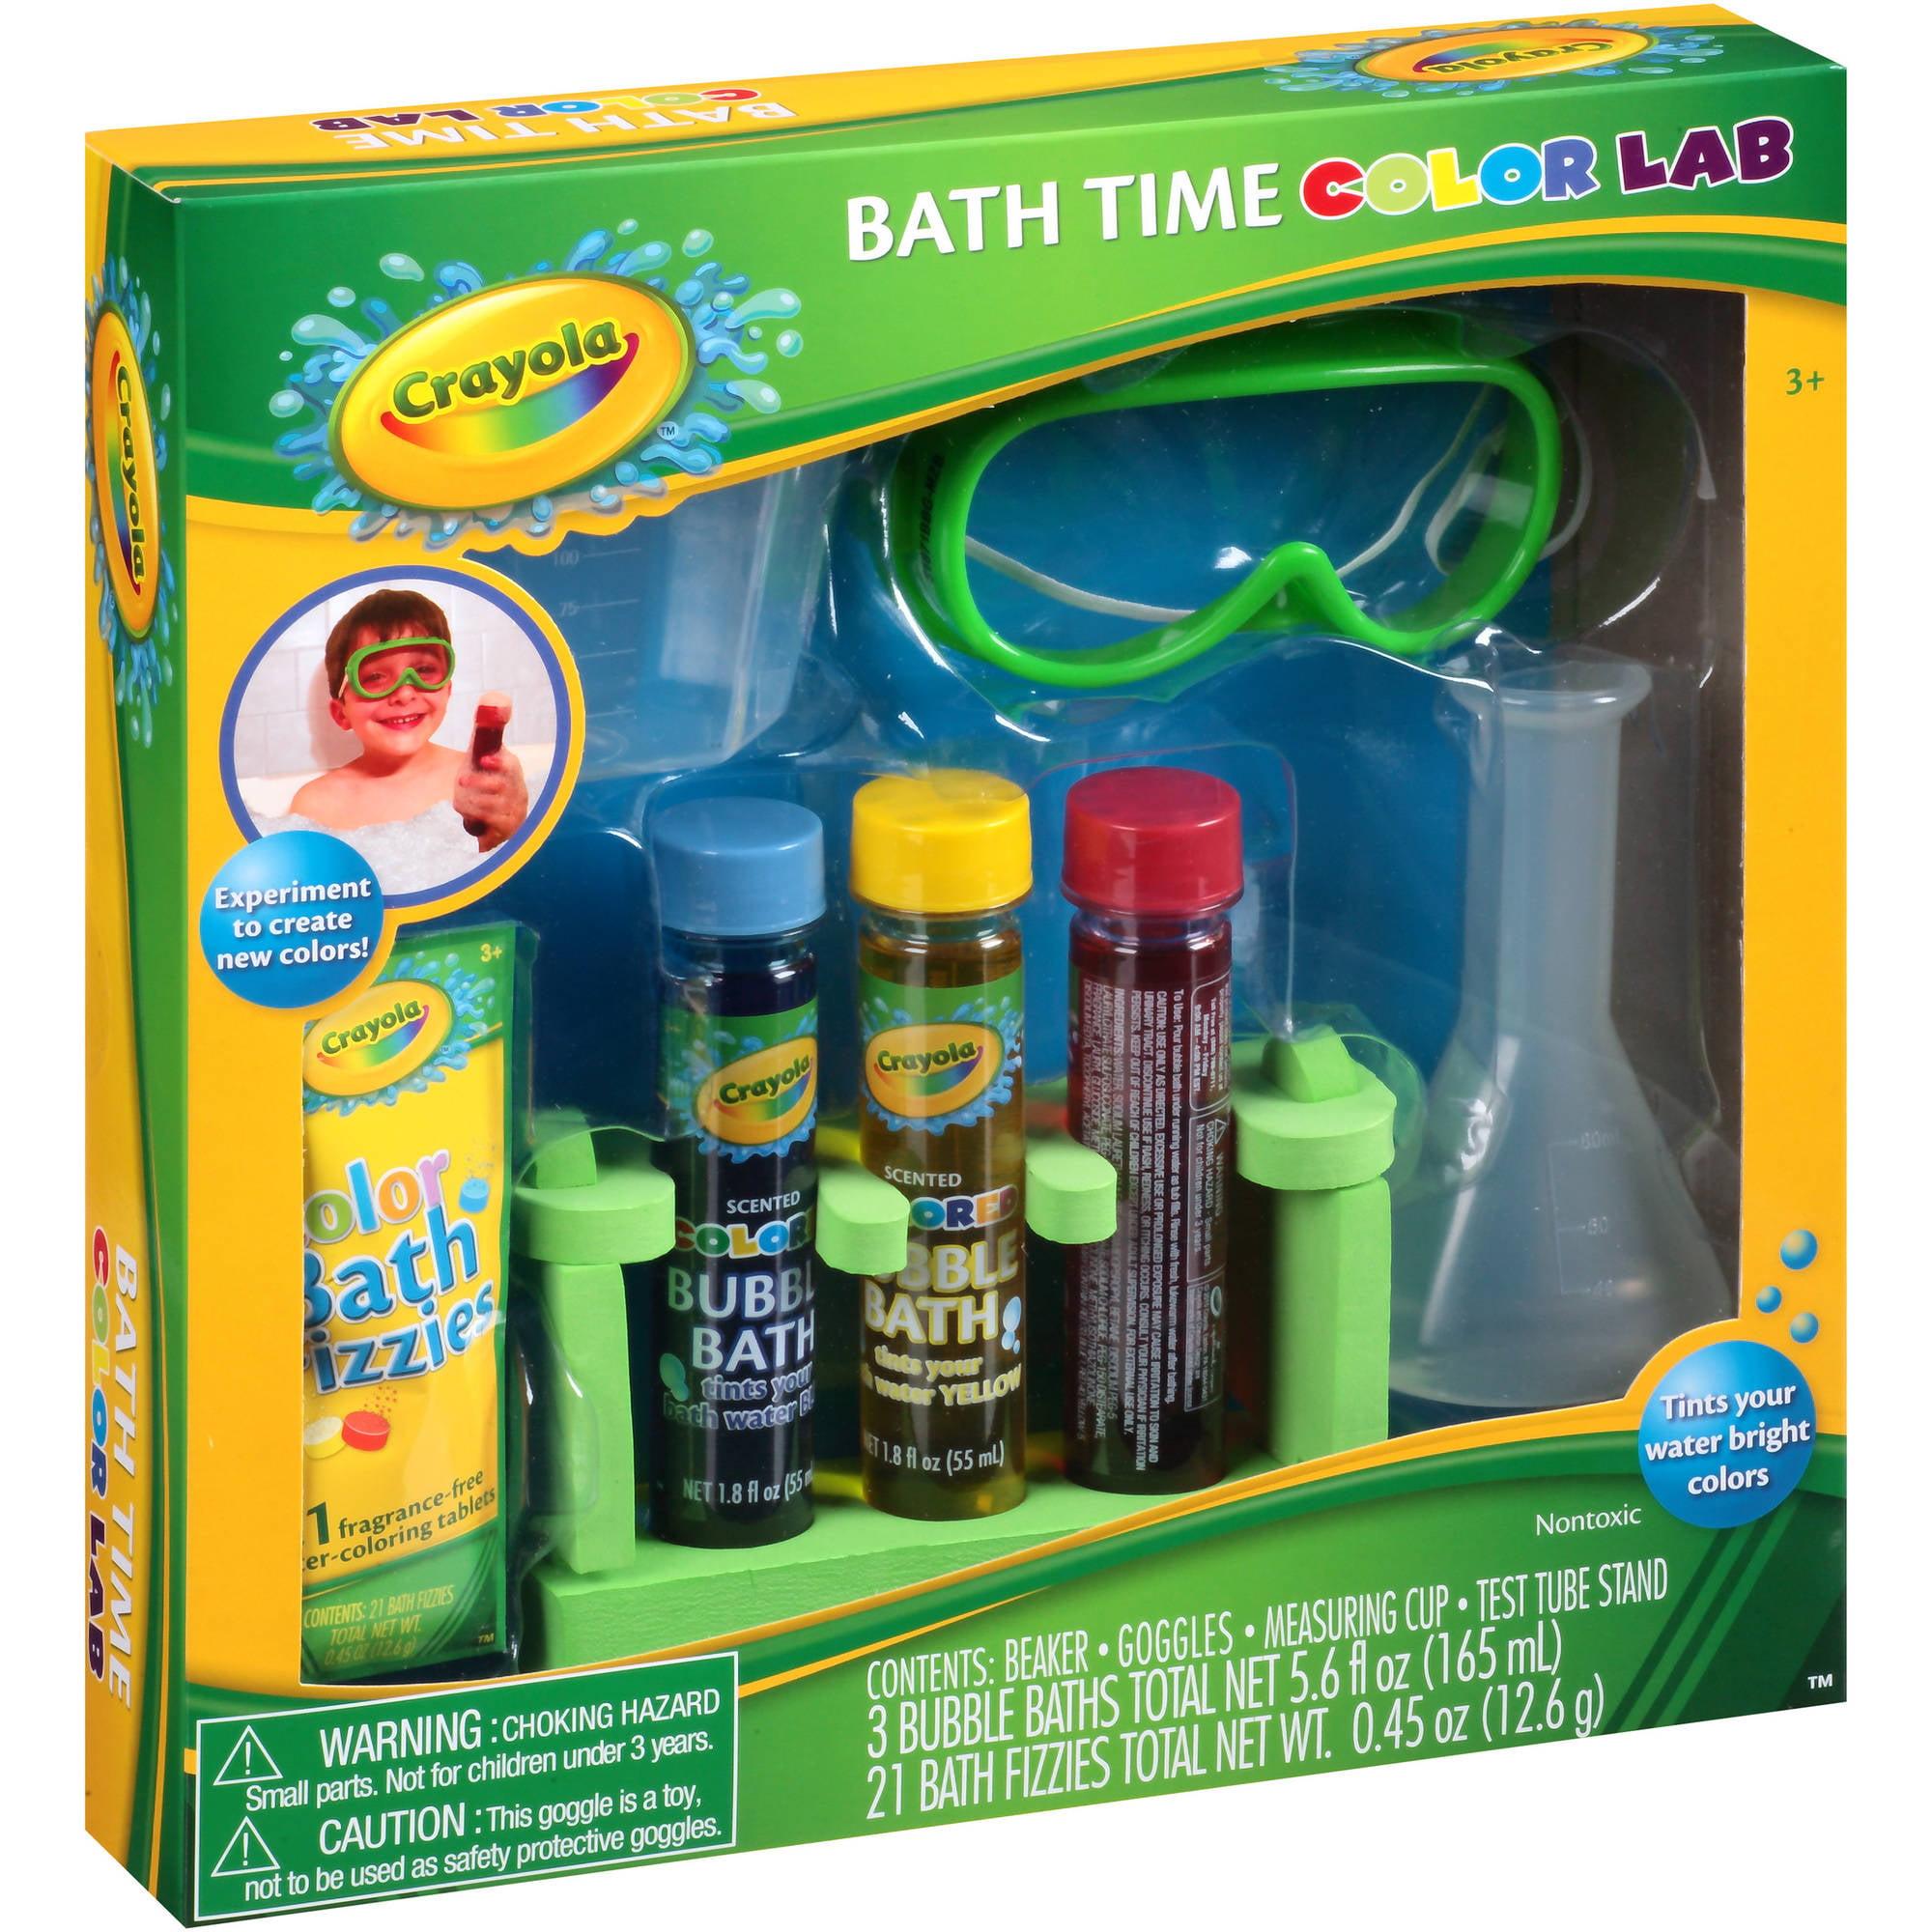 Crayola Bath Time Color Lab Gift Set, 28 pc